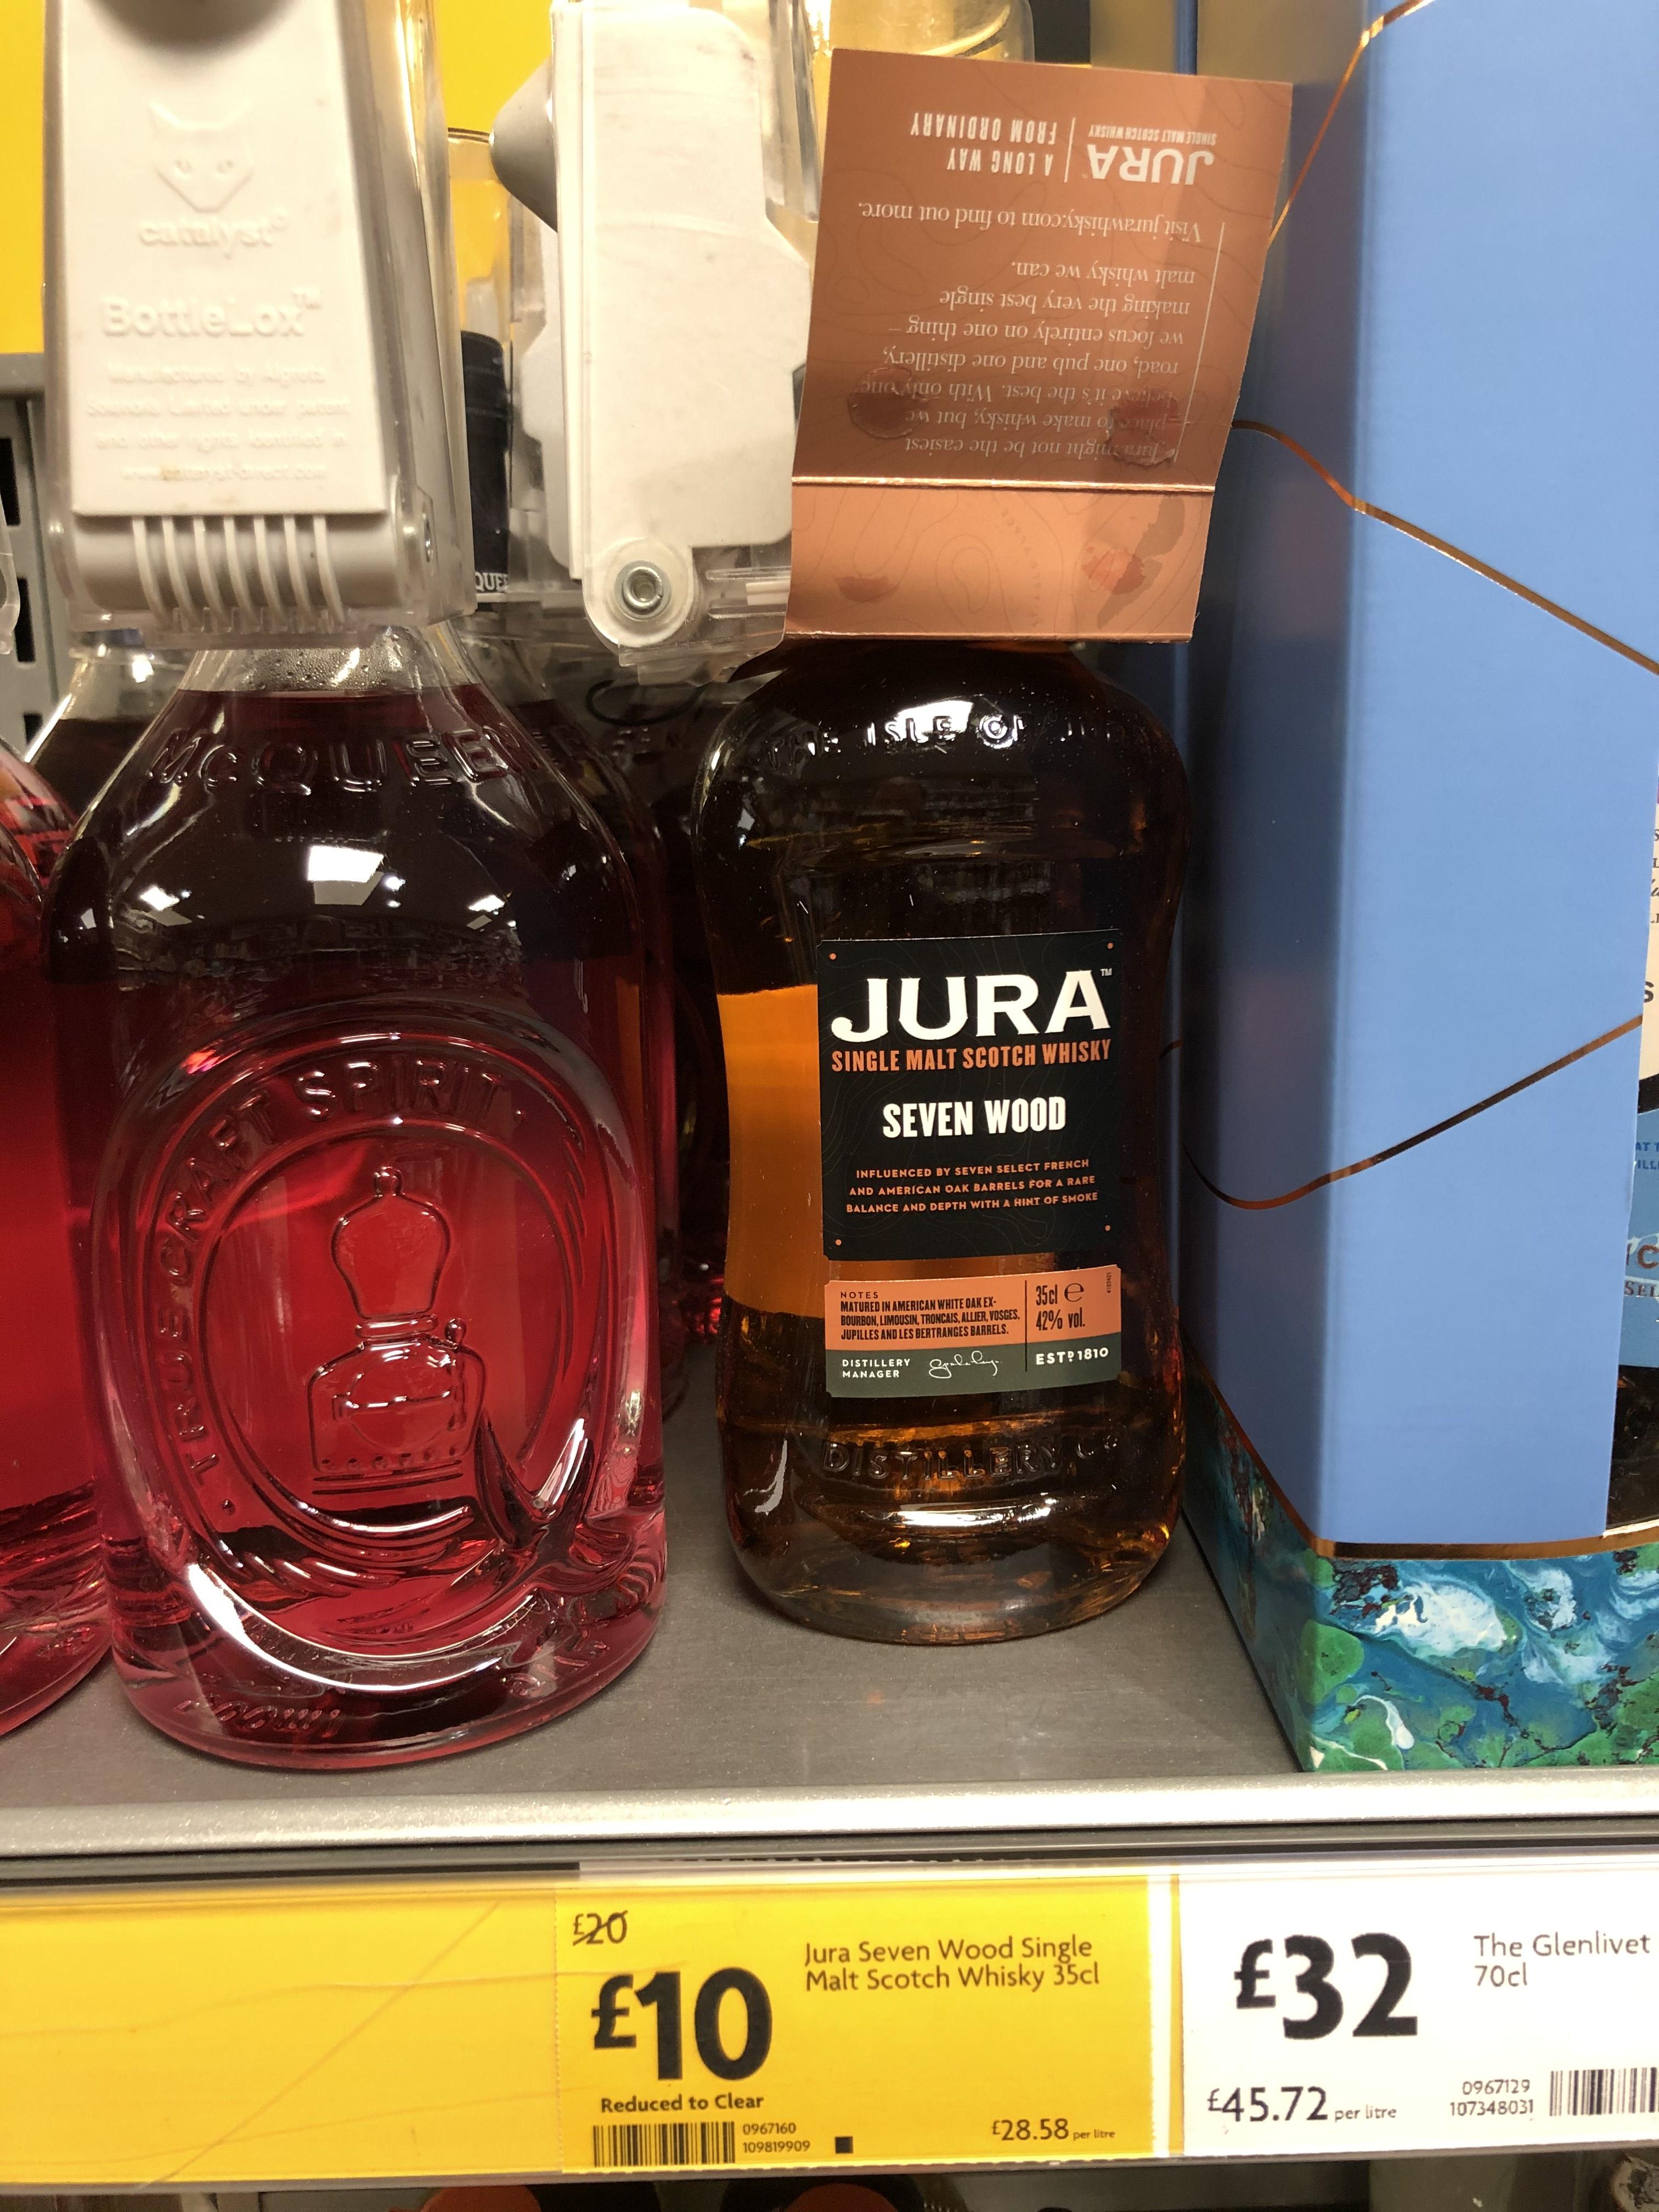 Jura Seven Wood single malt whisky 35cl £10 at Morrisons Maidstone